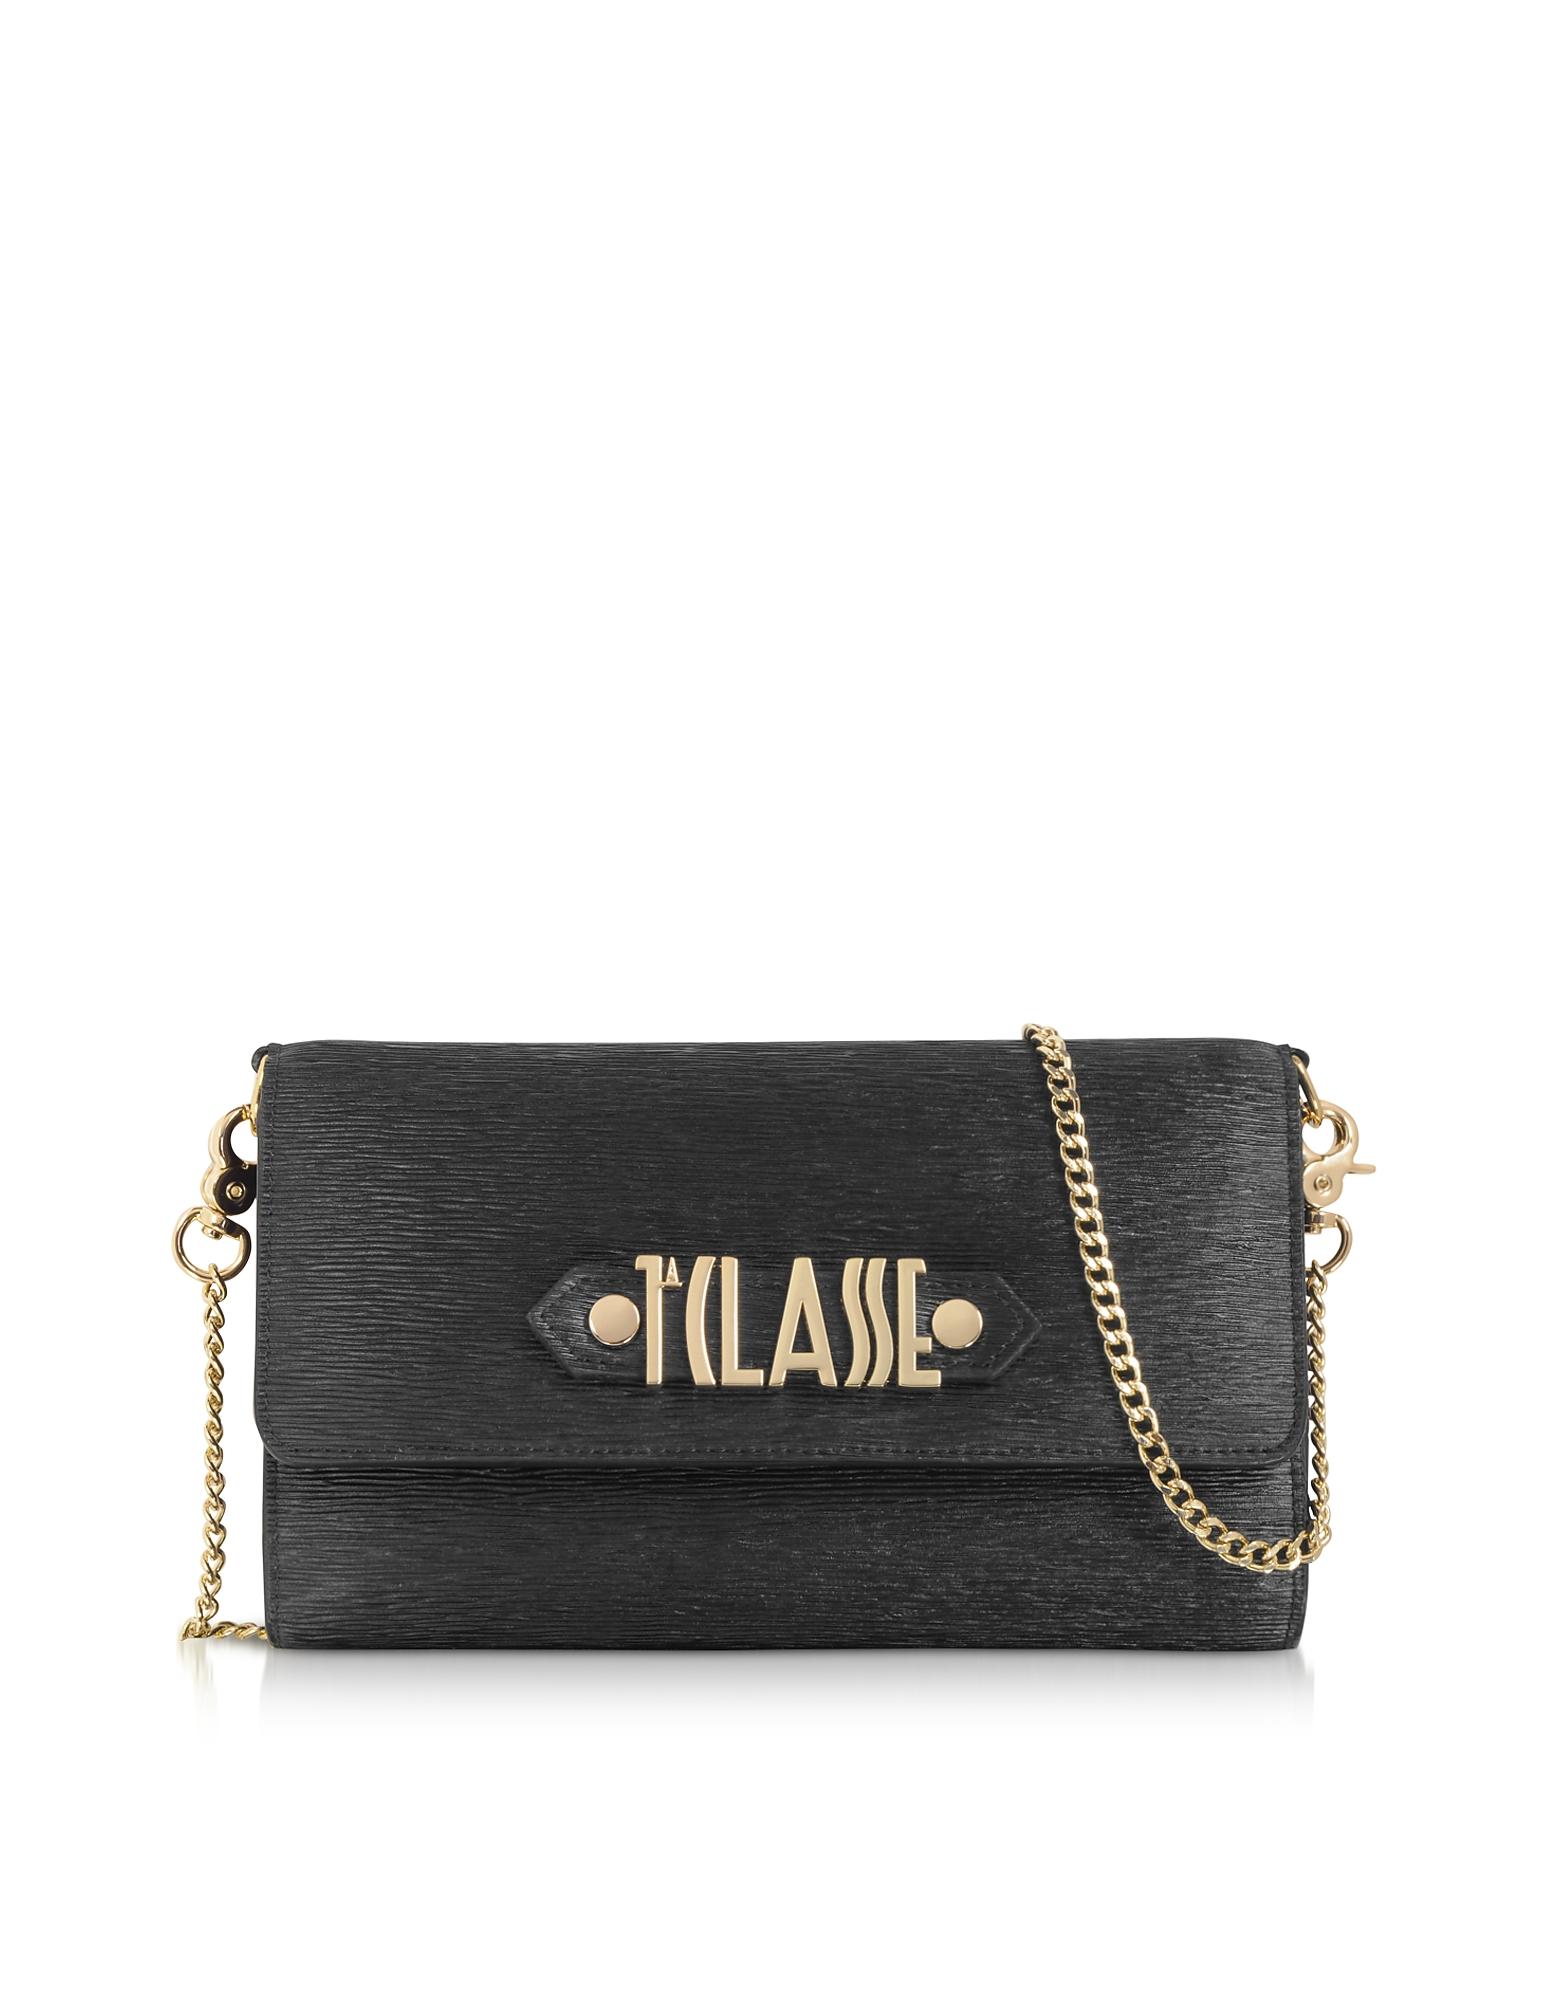 Alviero Martini 1A Classe Designer Handbags, Black Wallet Clutch w/ Signature